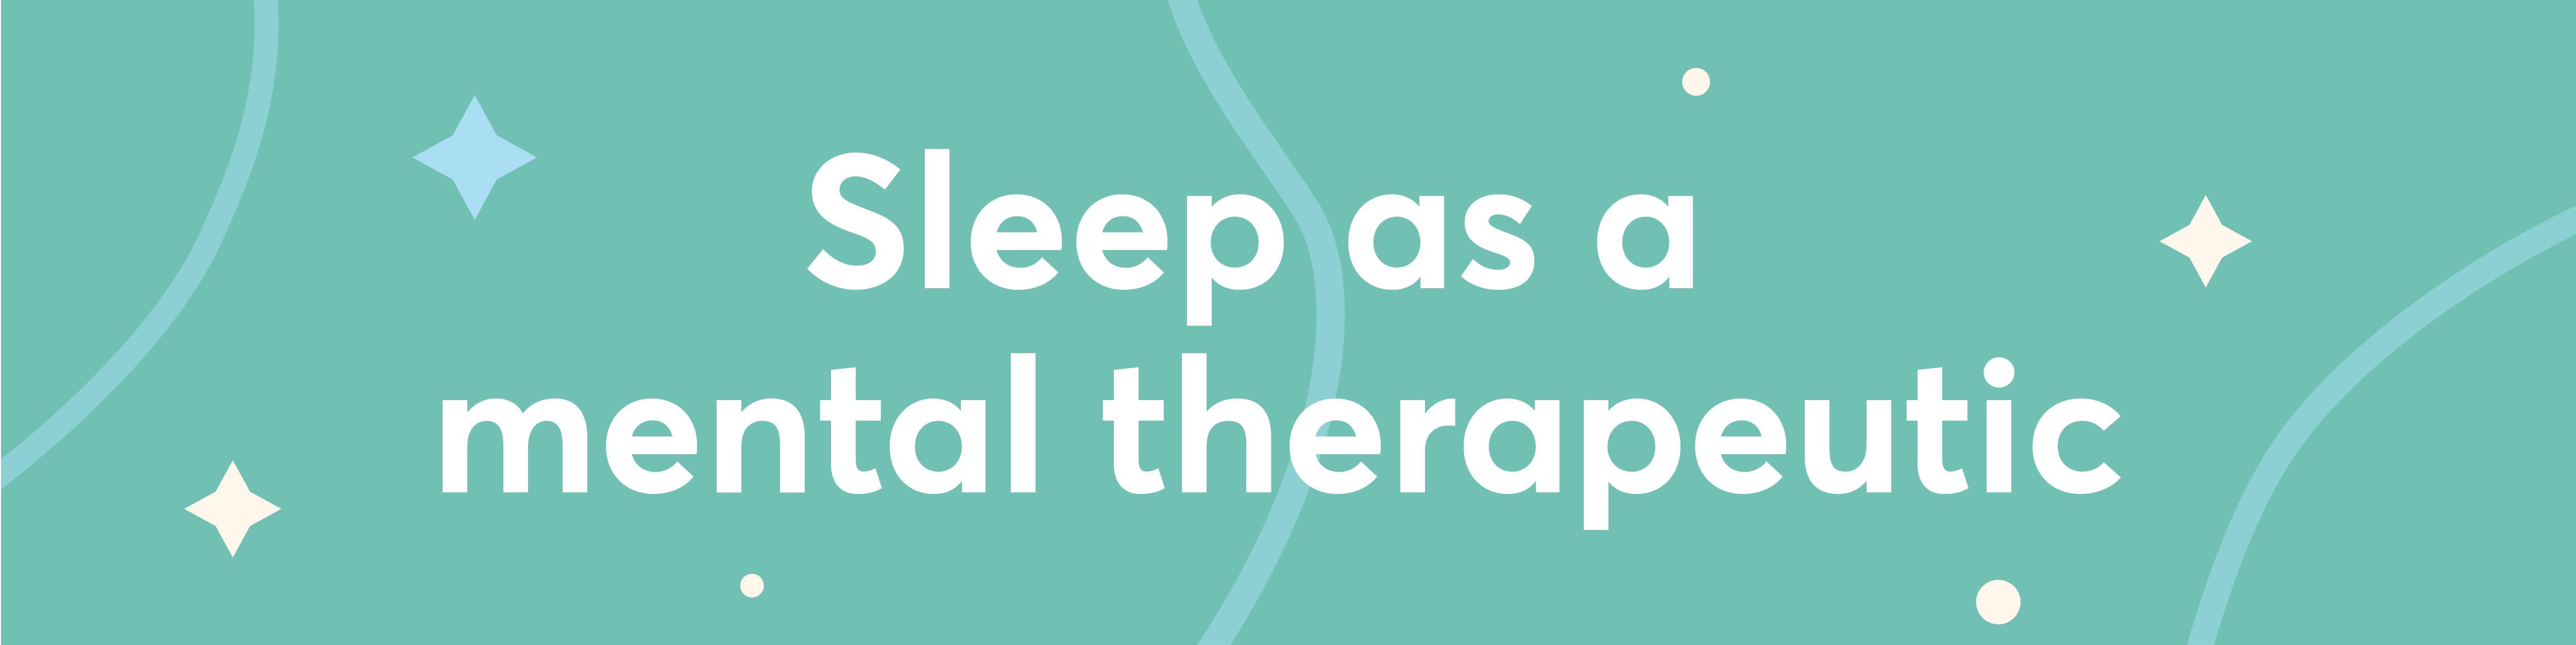 Shleep: Sleep as a mental therapeutic